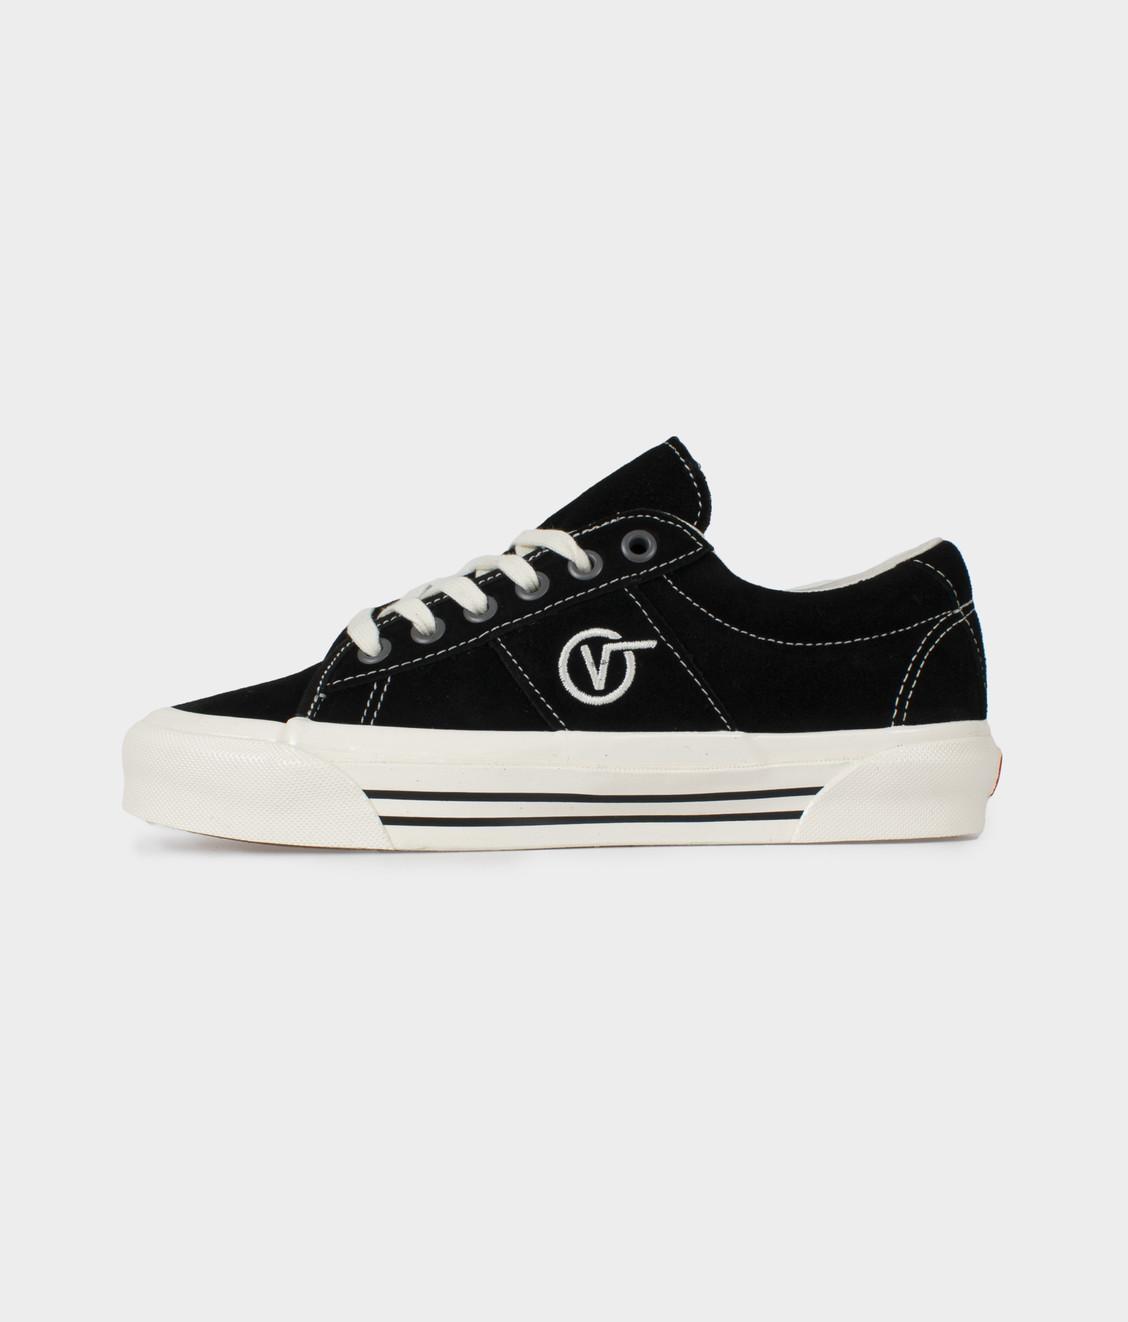 Vans Vans OG Sid LX Black